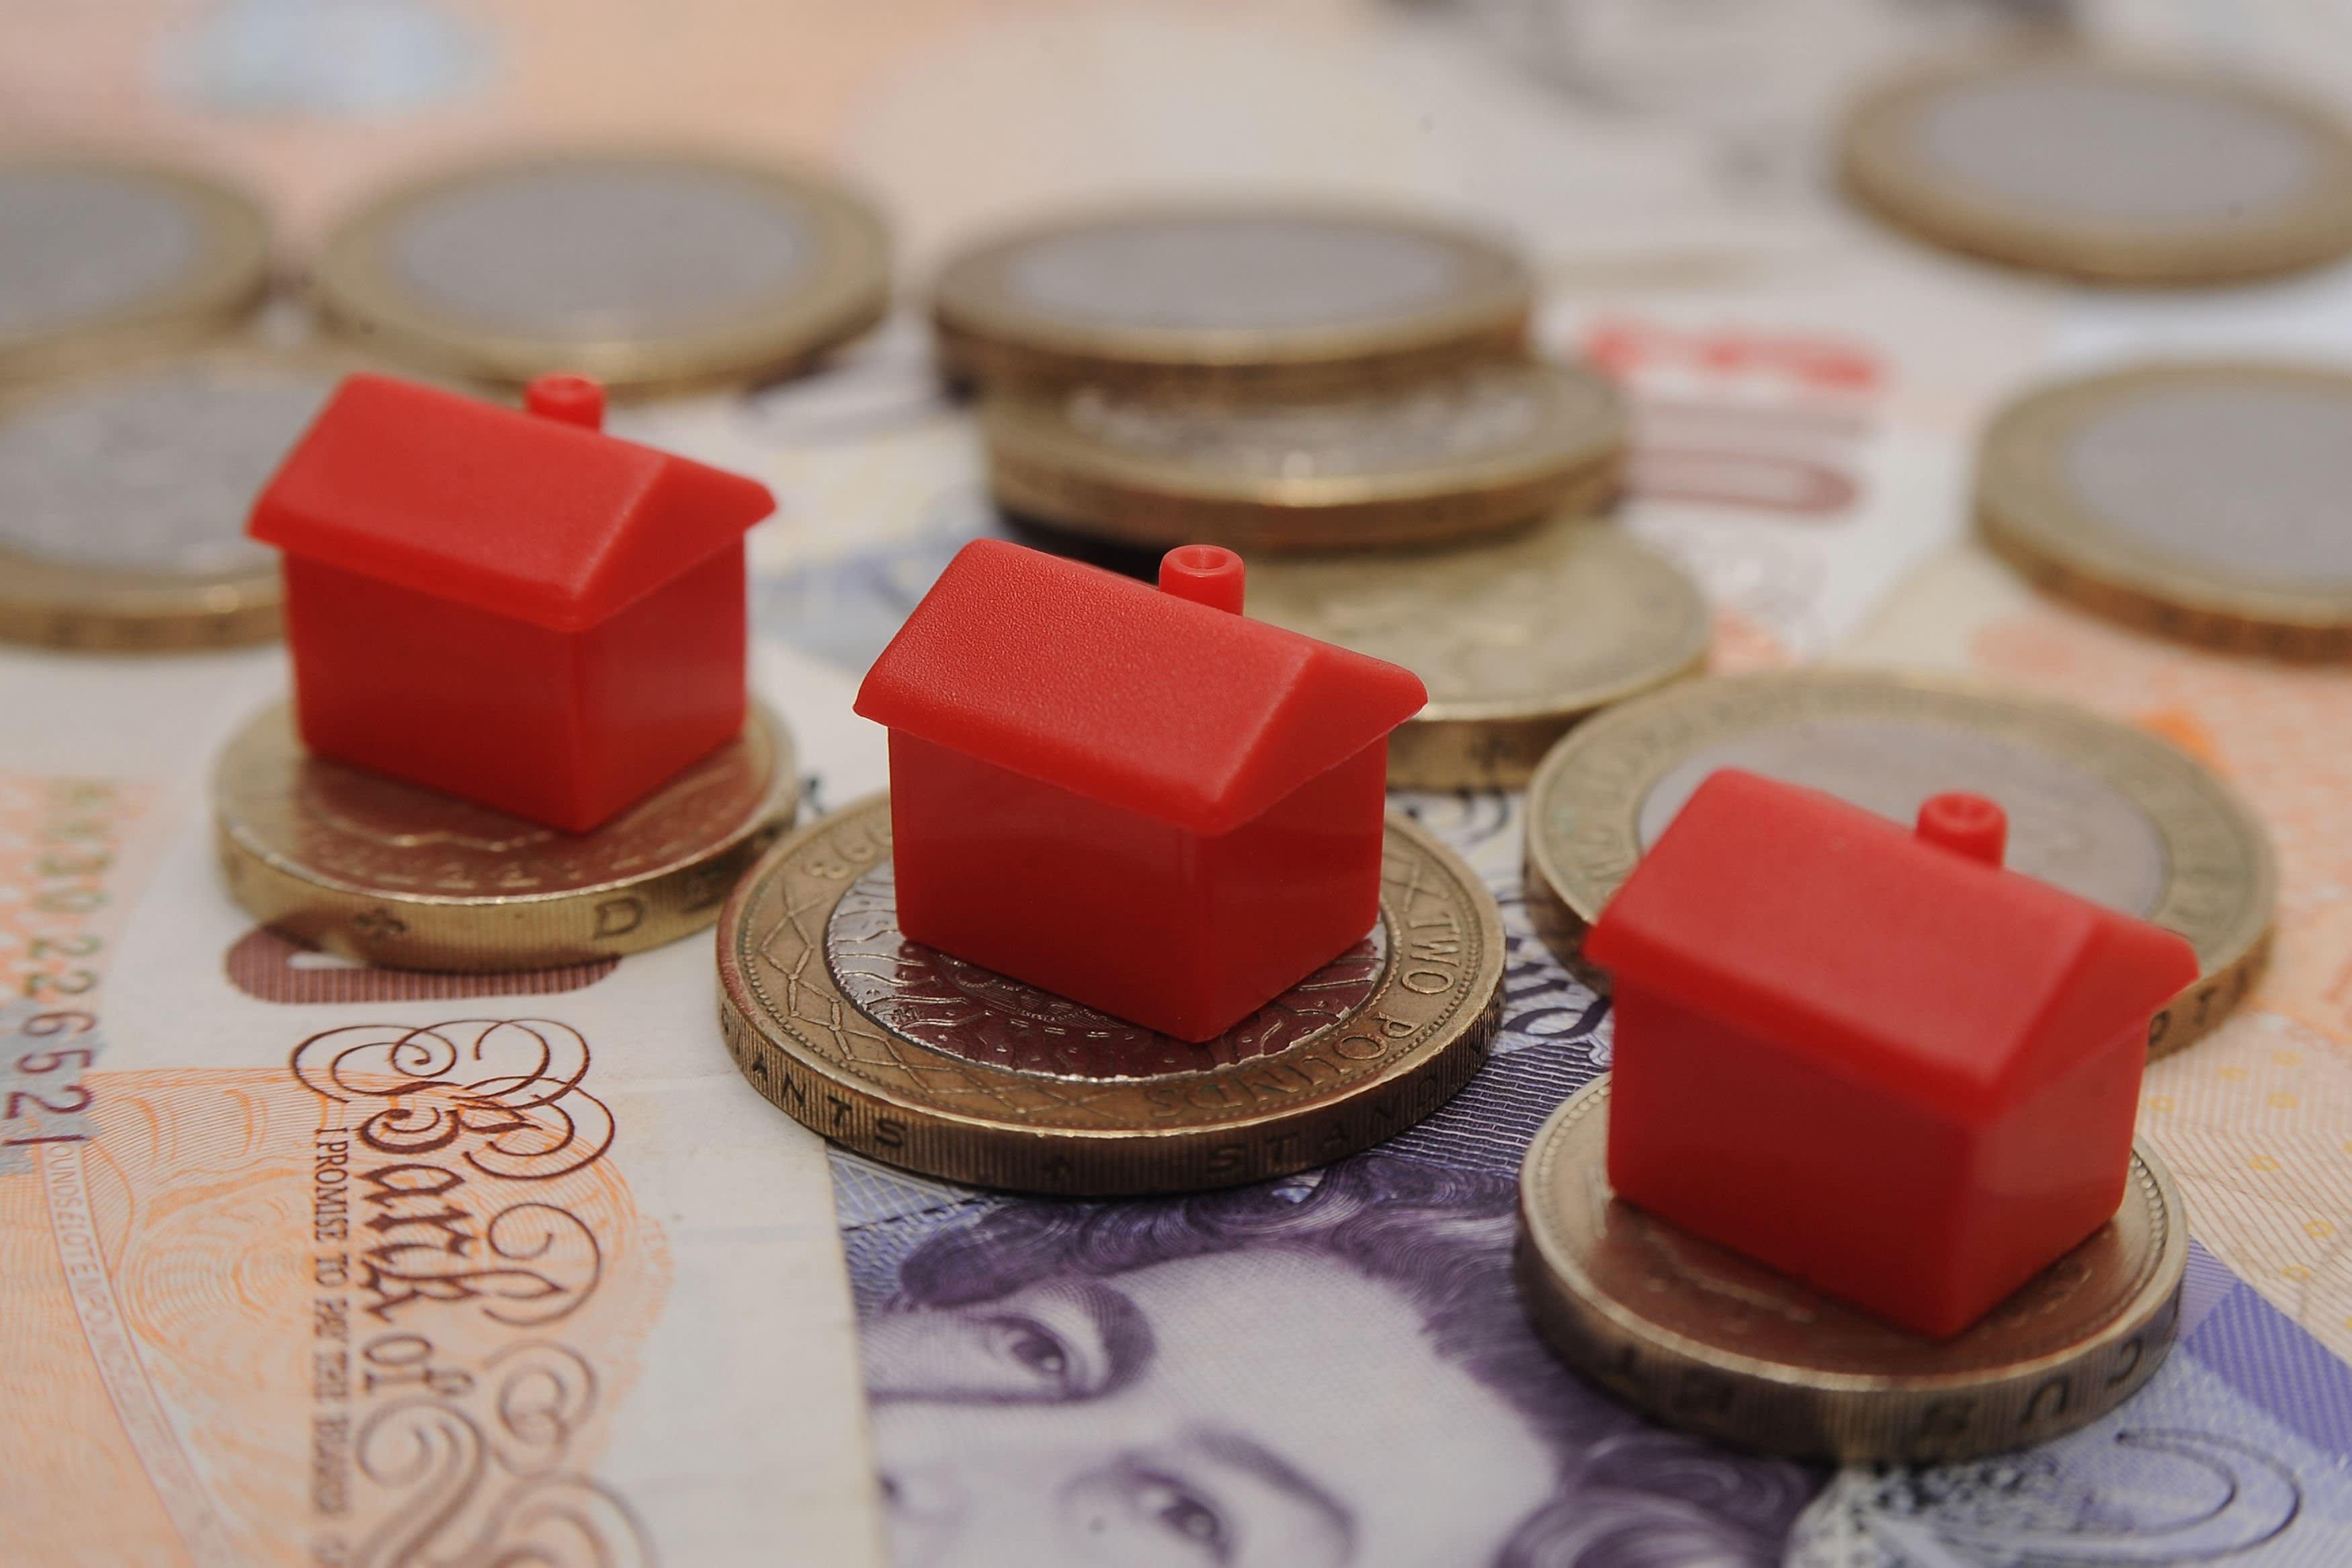 Stamp duty cut saves homebuyers £108m